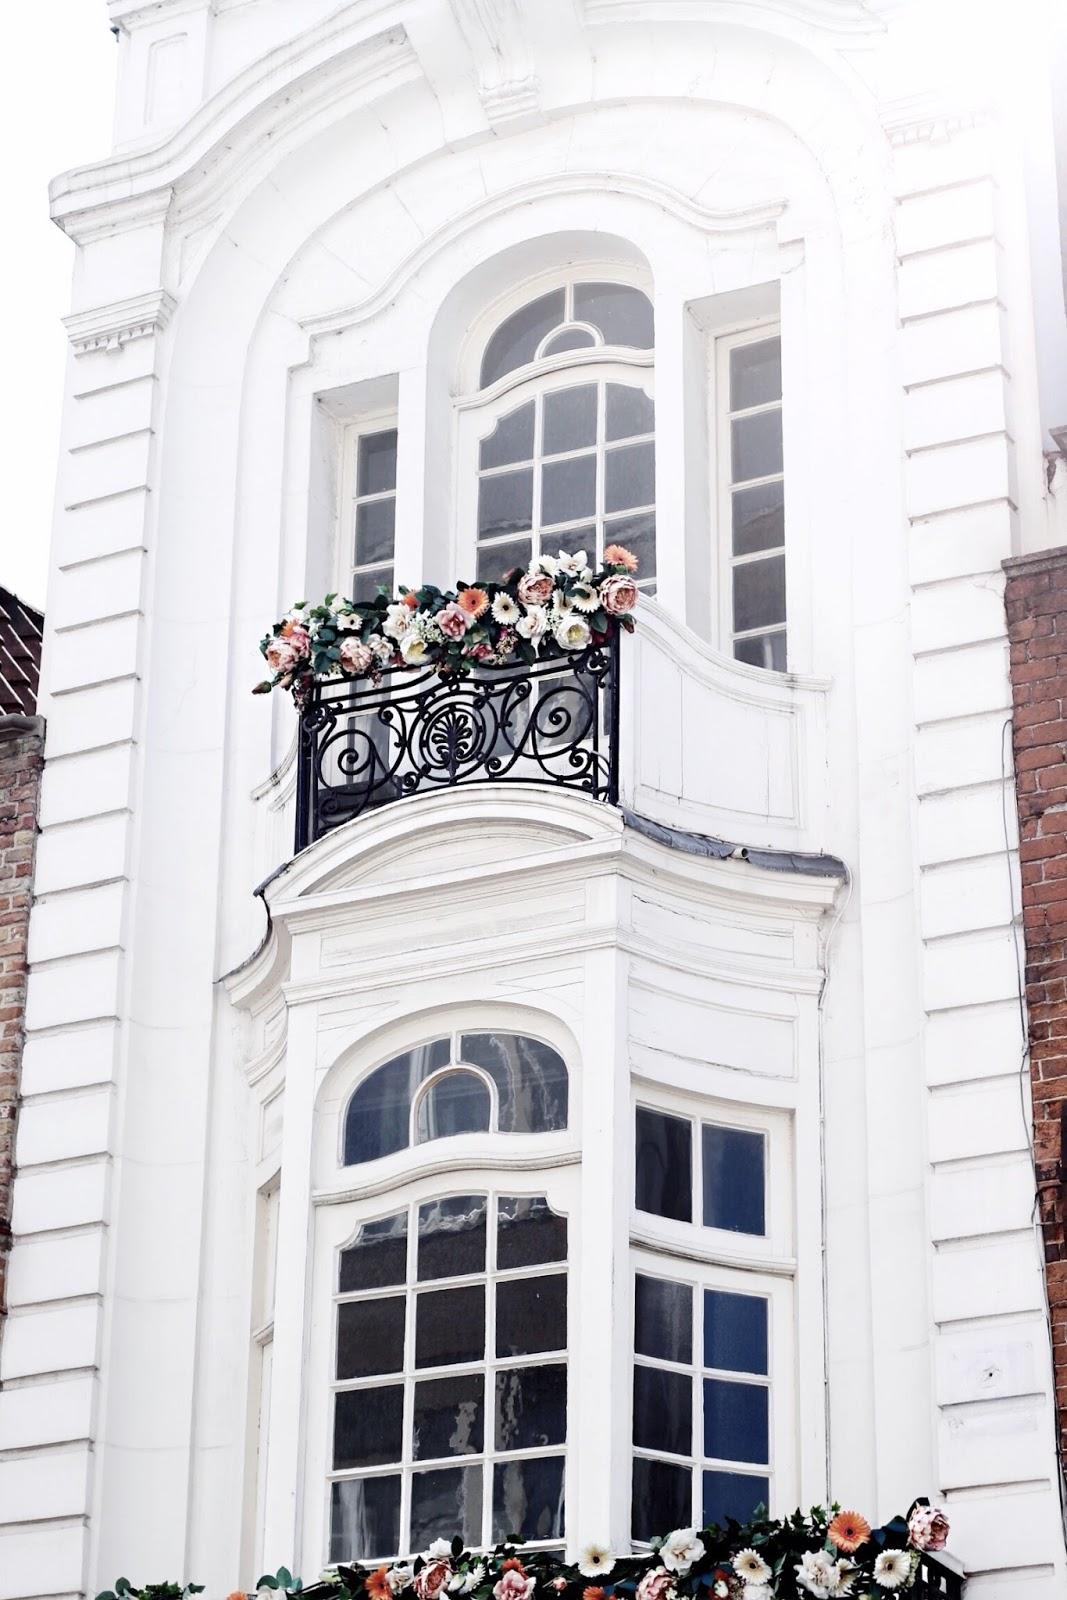 White Buildings in Bruges